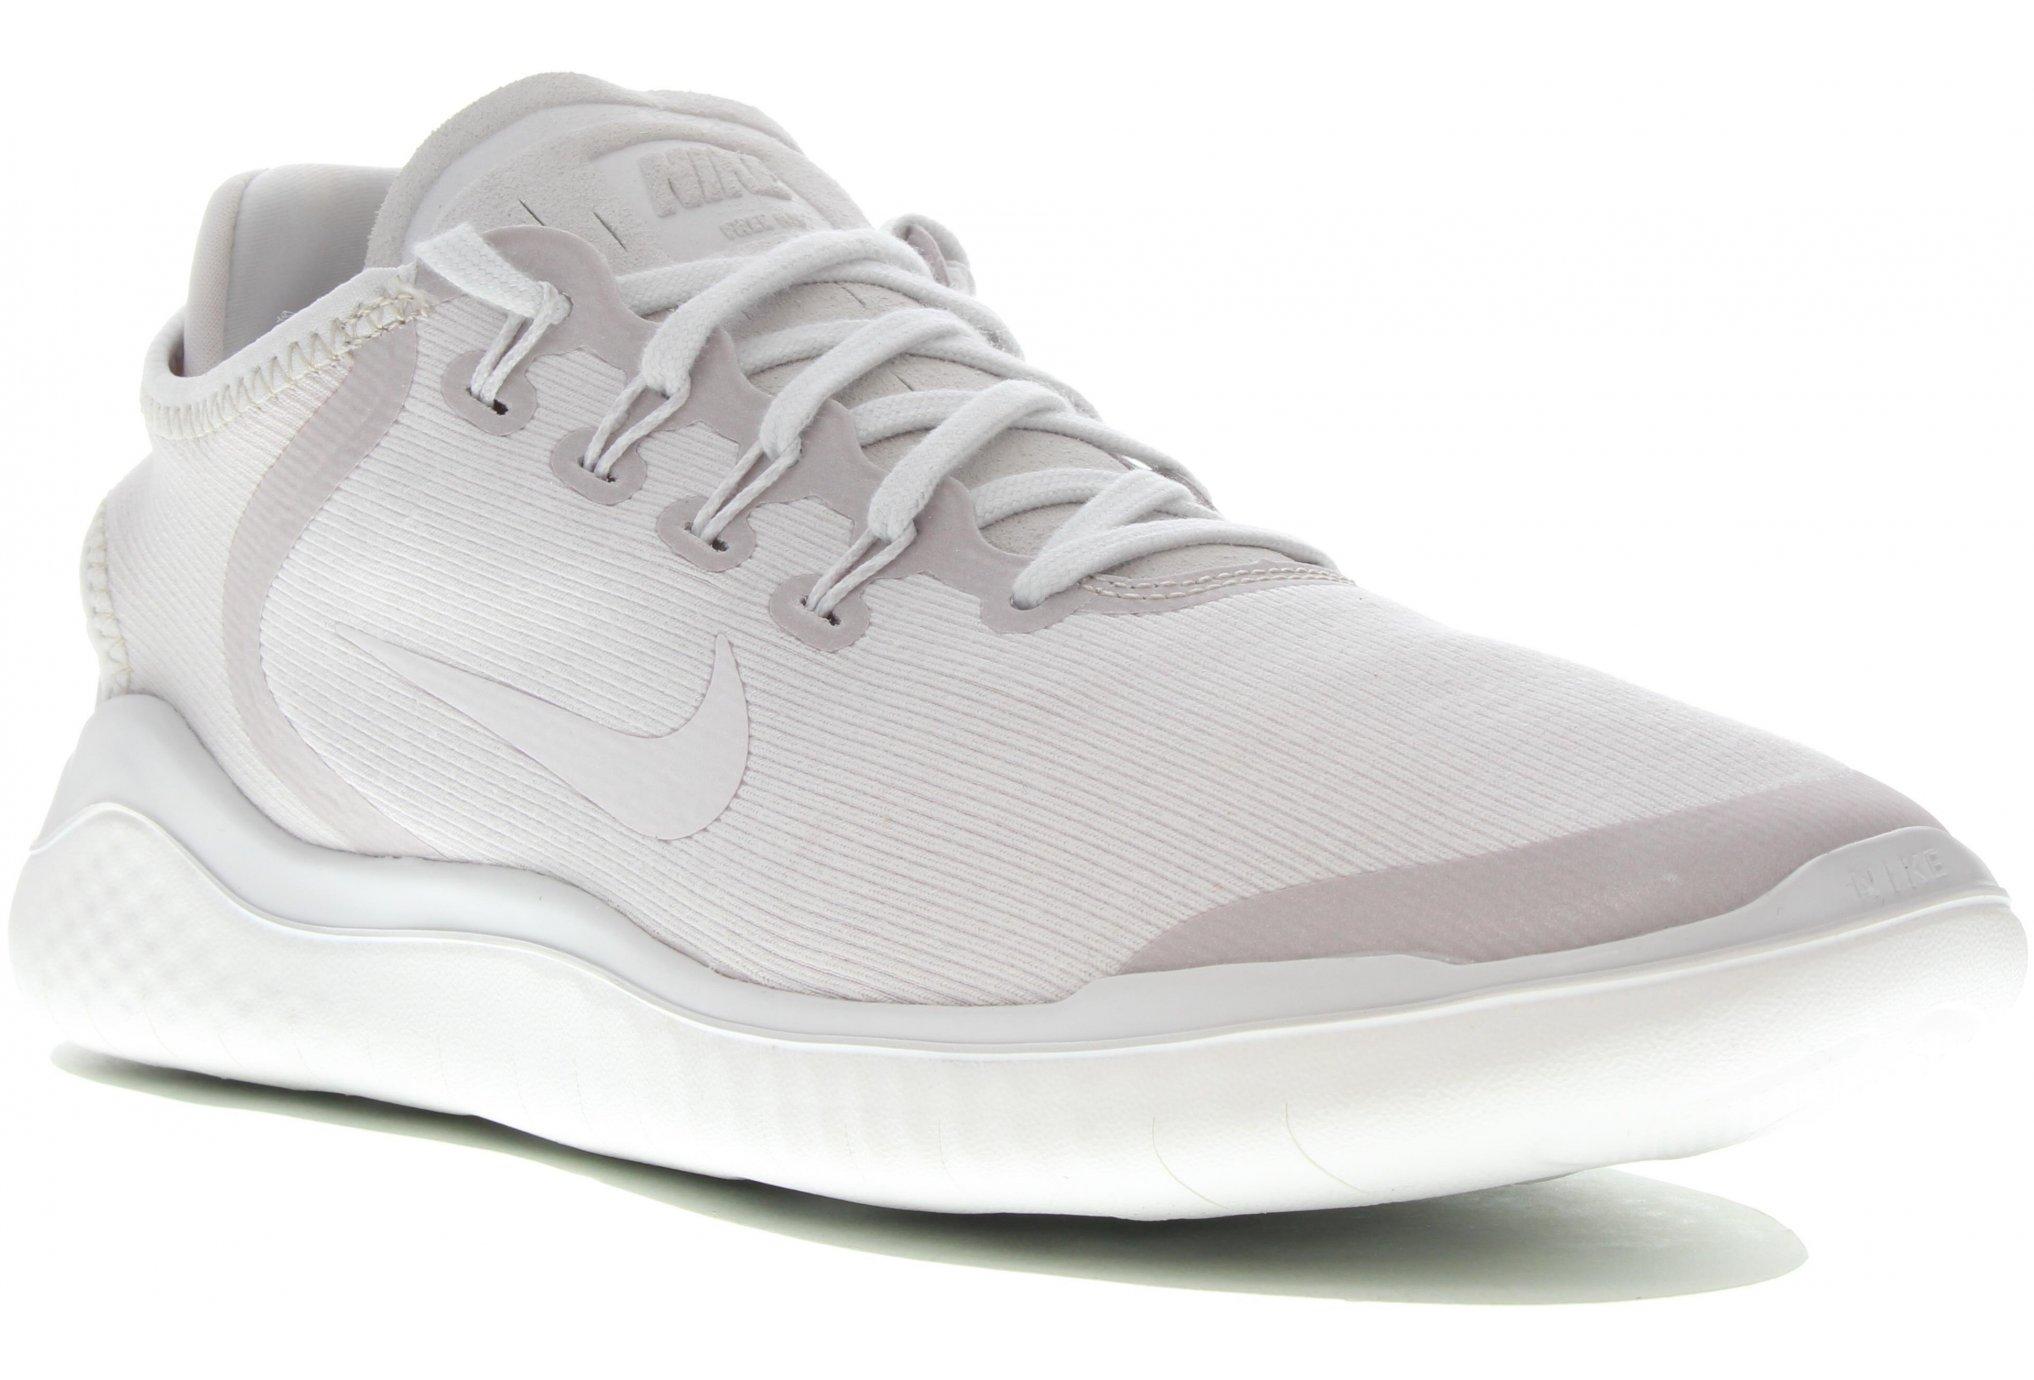 e0ae96726ca52 Precios de Nike Free RN 2018 talla 40 baratas - Ofertas para comprar ...